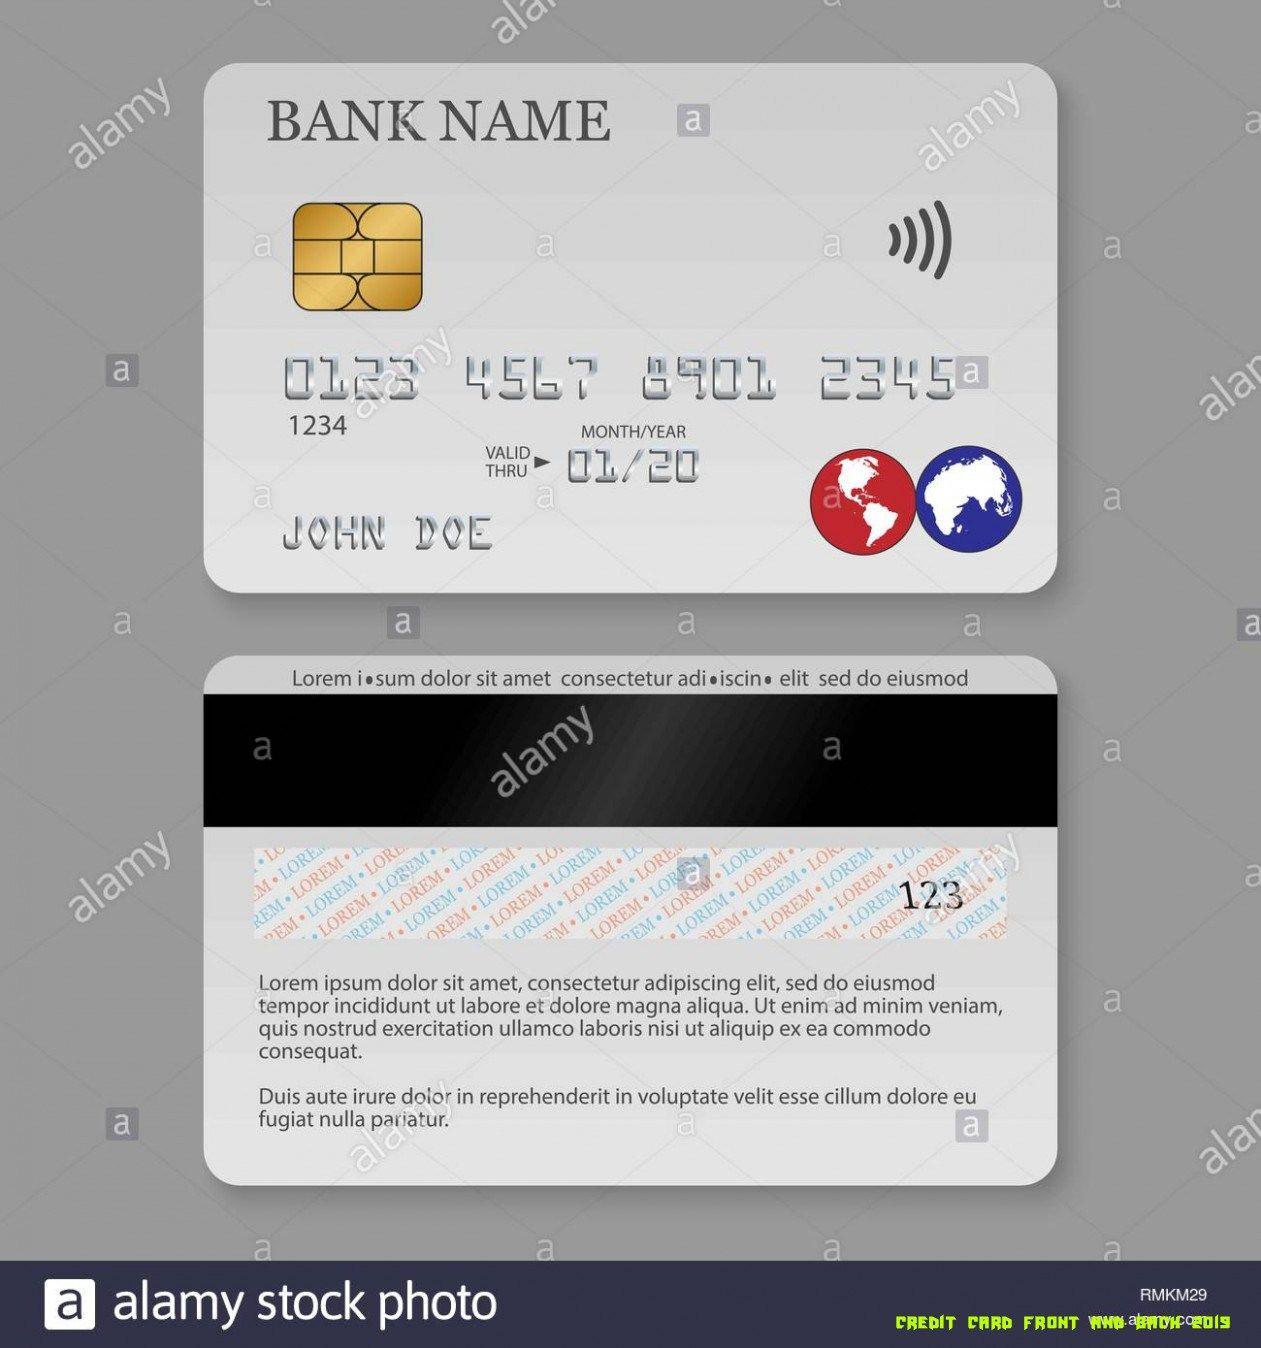 Pin By Golden Exploit On Debit Card Design In 2020 Credit Card Online Visa Card Numbers Credit Card Numbers